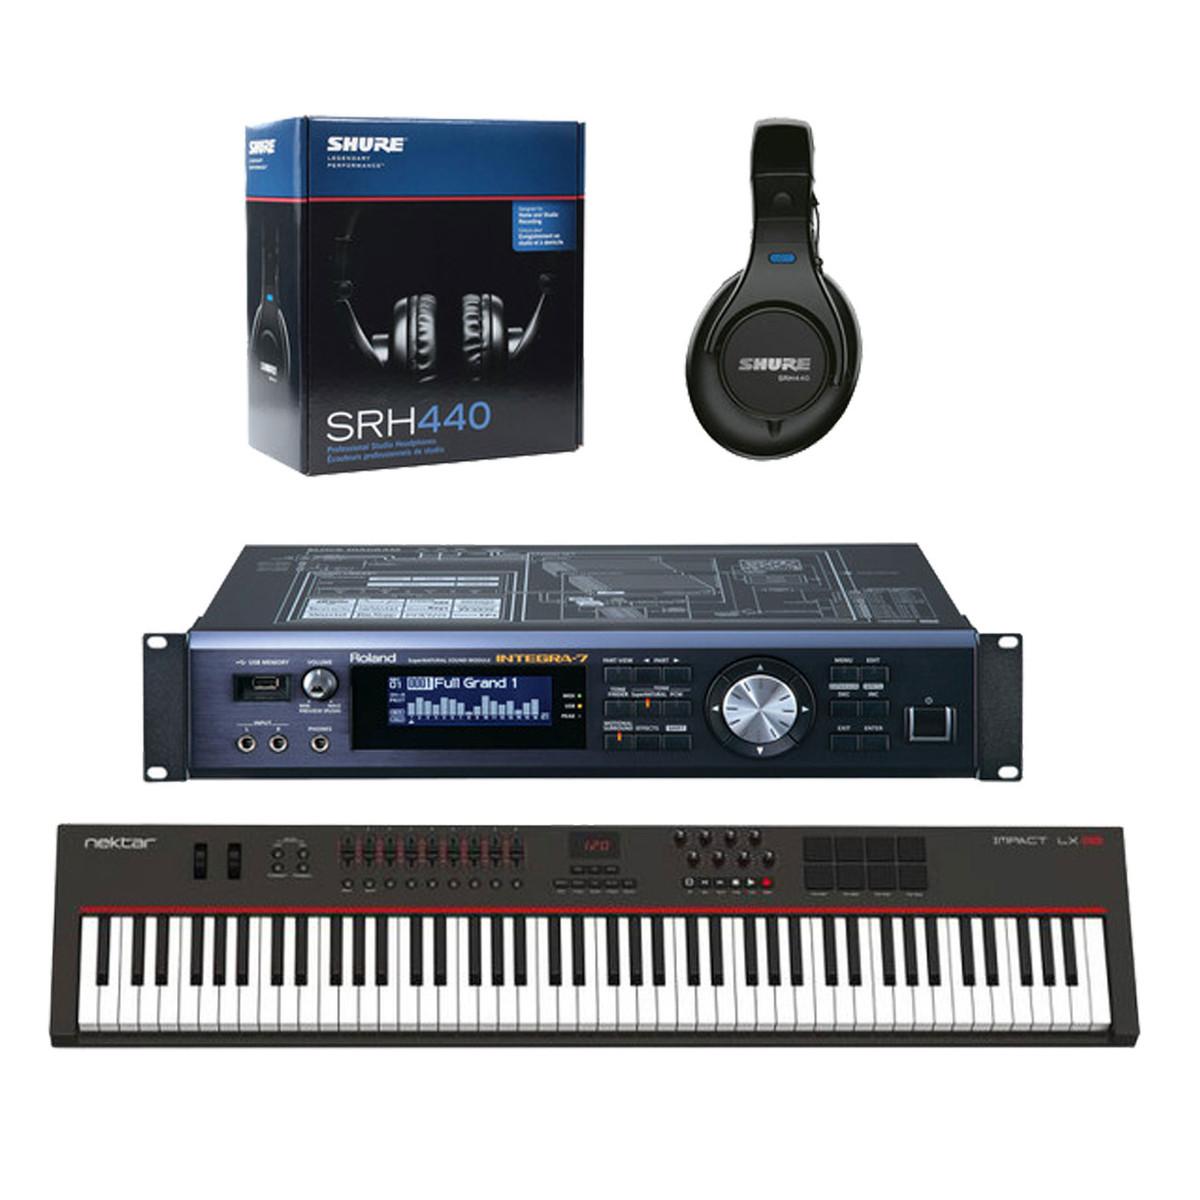 DISC Roland INTEGRA-7, Nektar LX-88 Controller and Headphones